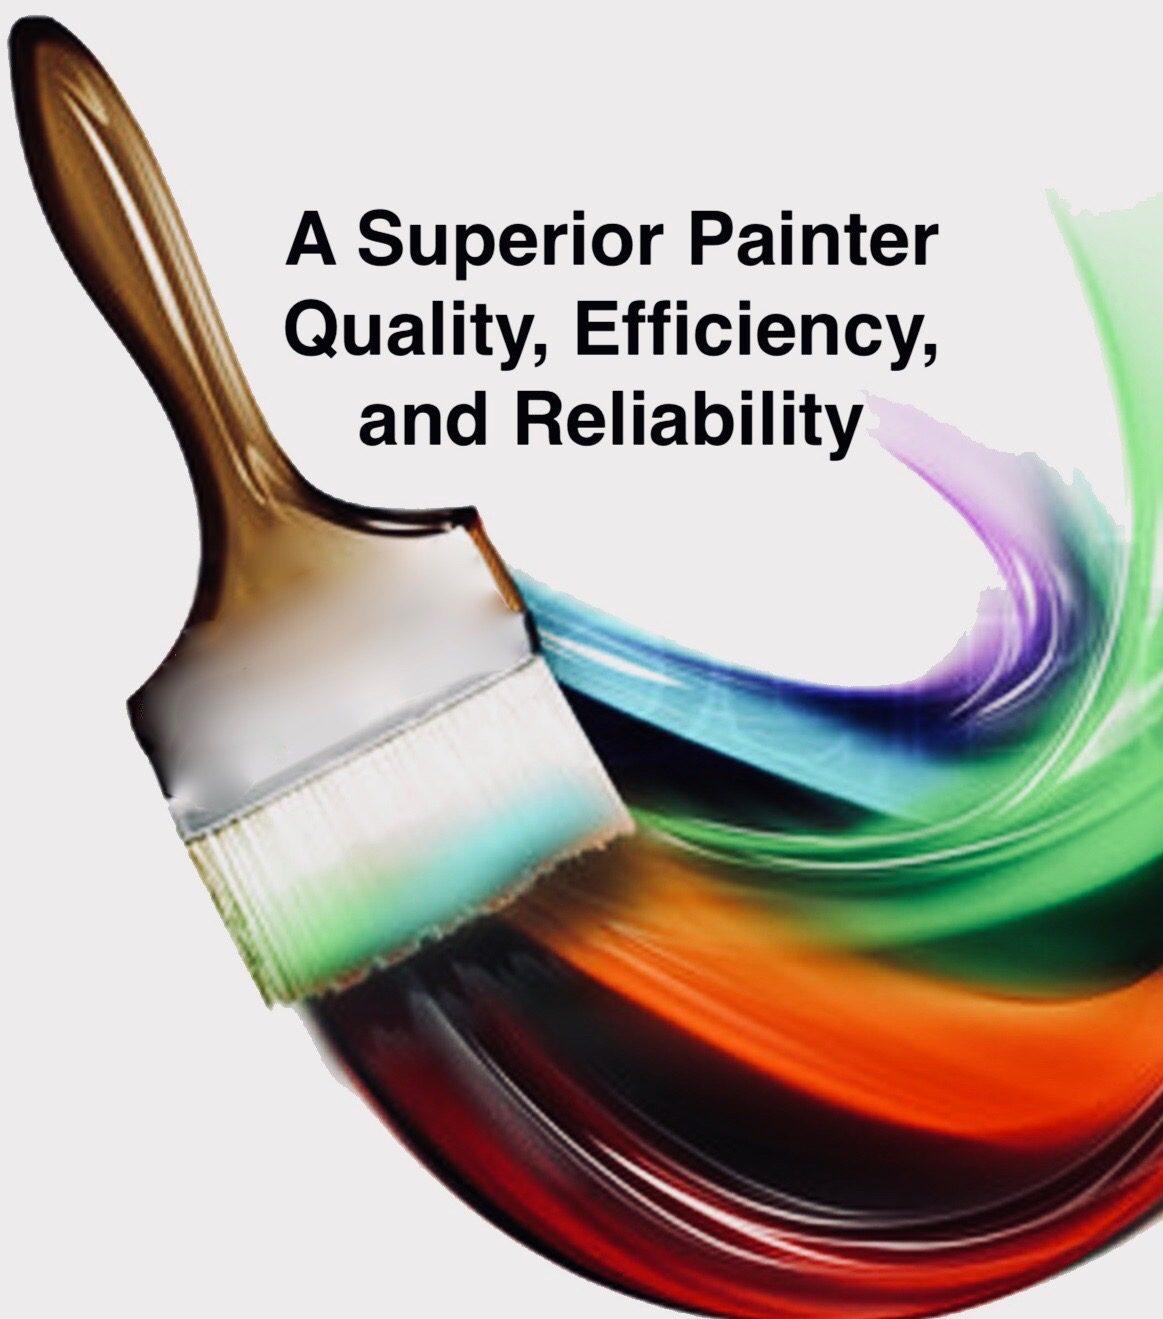 A Superior Painter